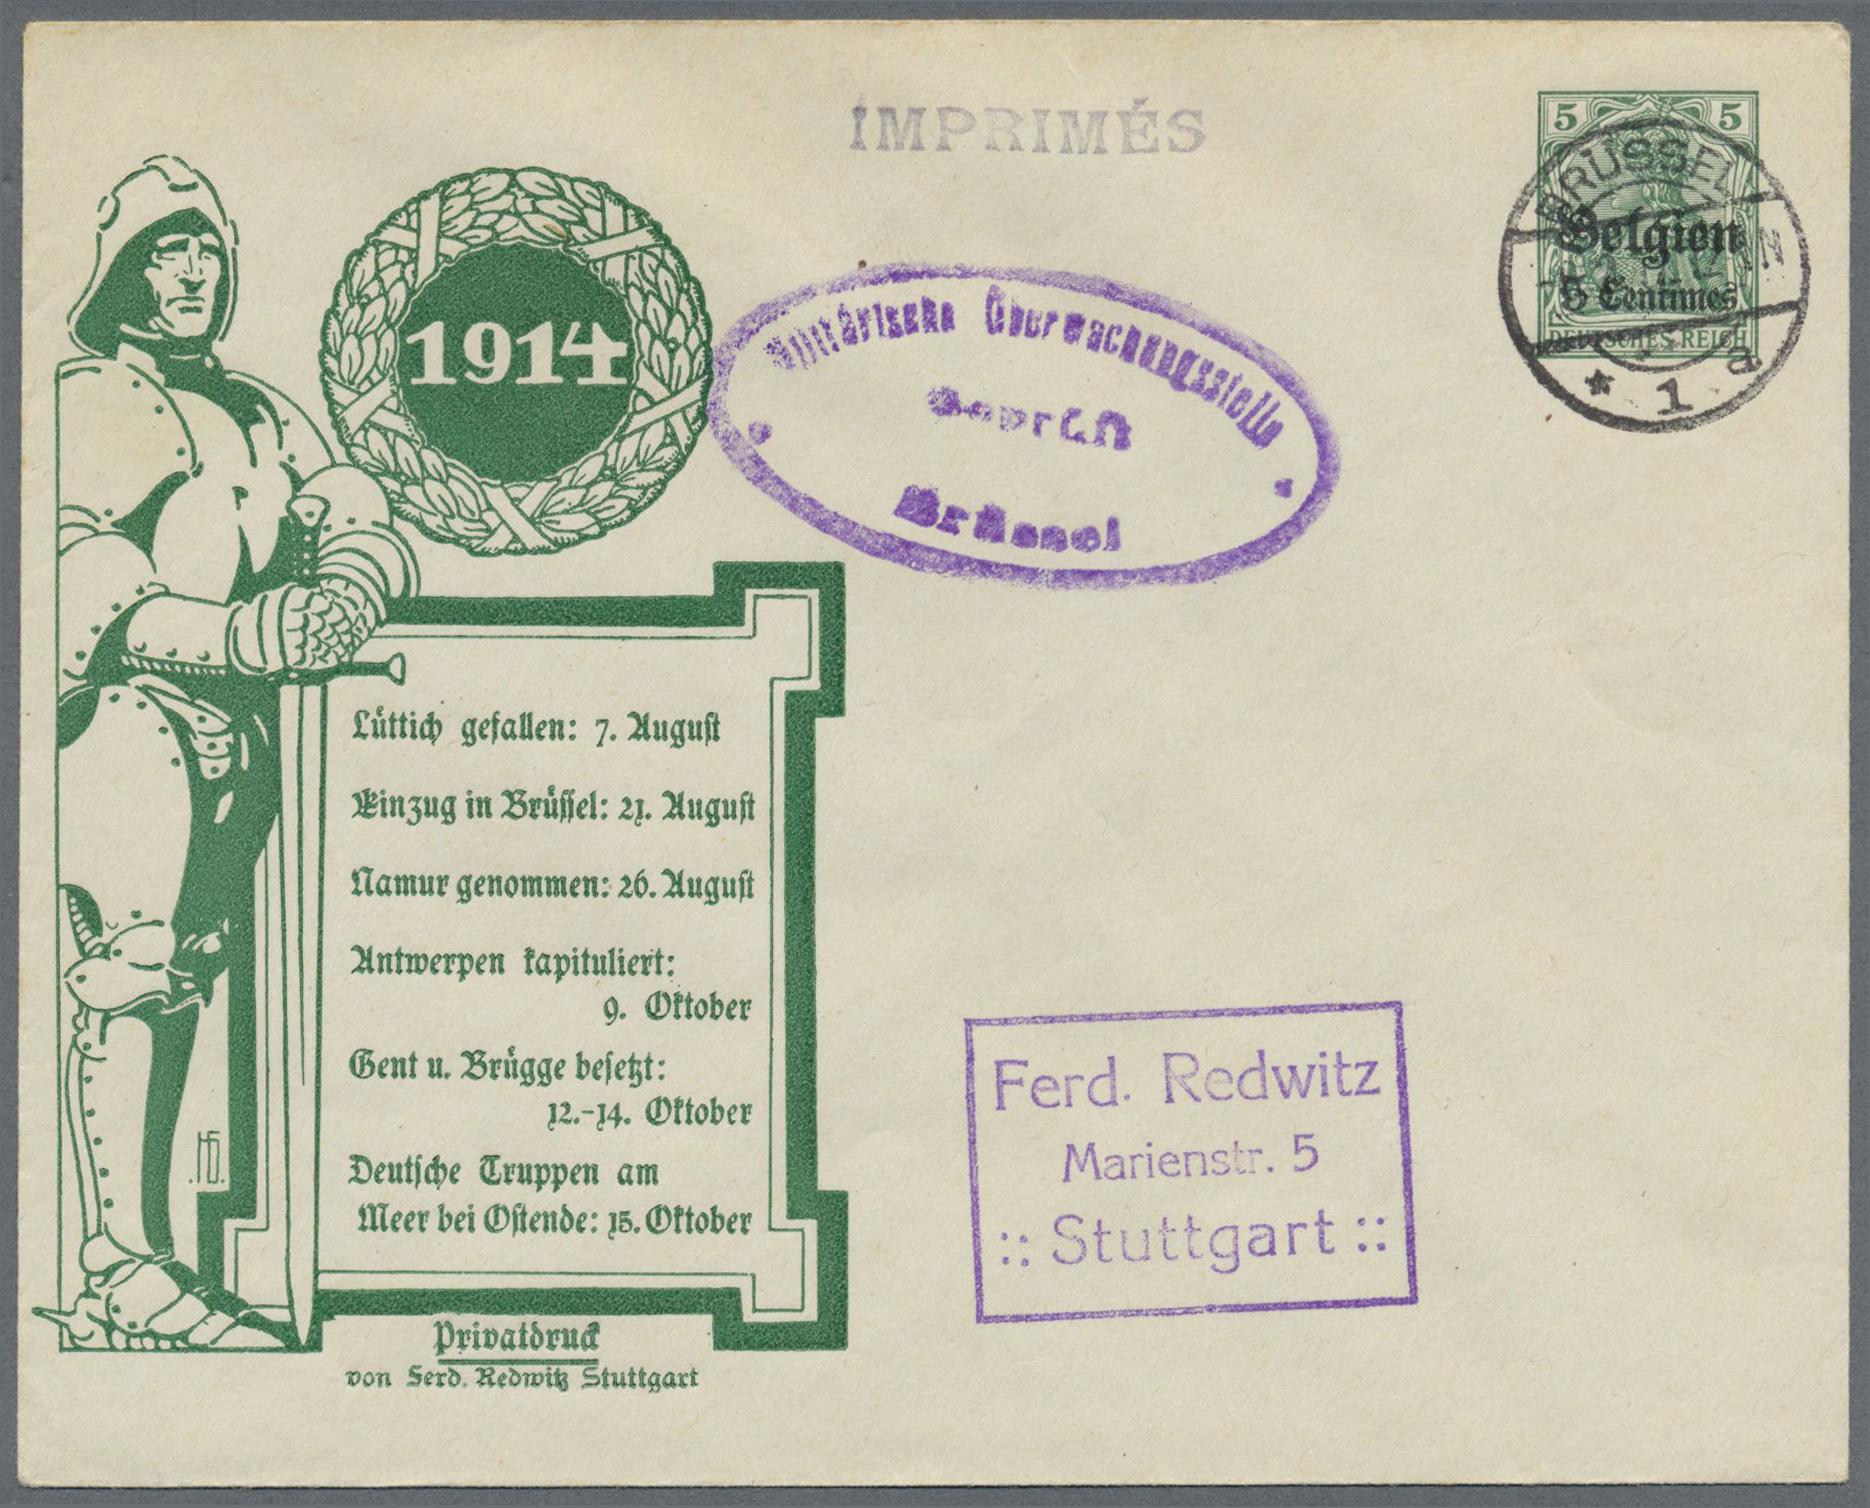 Lot 22647 - Deutsche Besetzung I. WK: Landespost in Belgien - Ganzsachen  -  Auktionshaus Christoph Gärtner GmbH & Co. KG Single lots Germany + Picture Postcards. Auction #39 Day 5